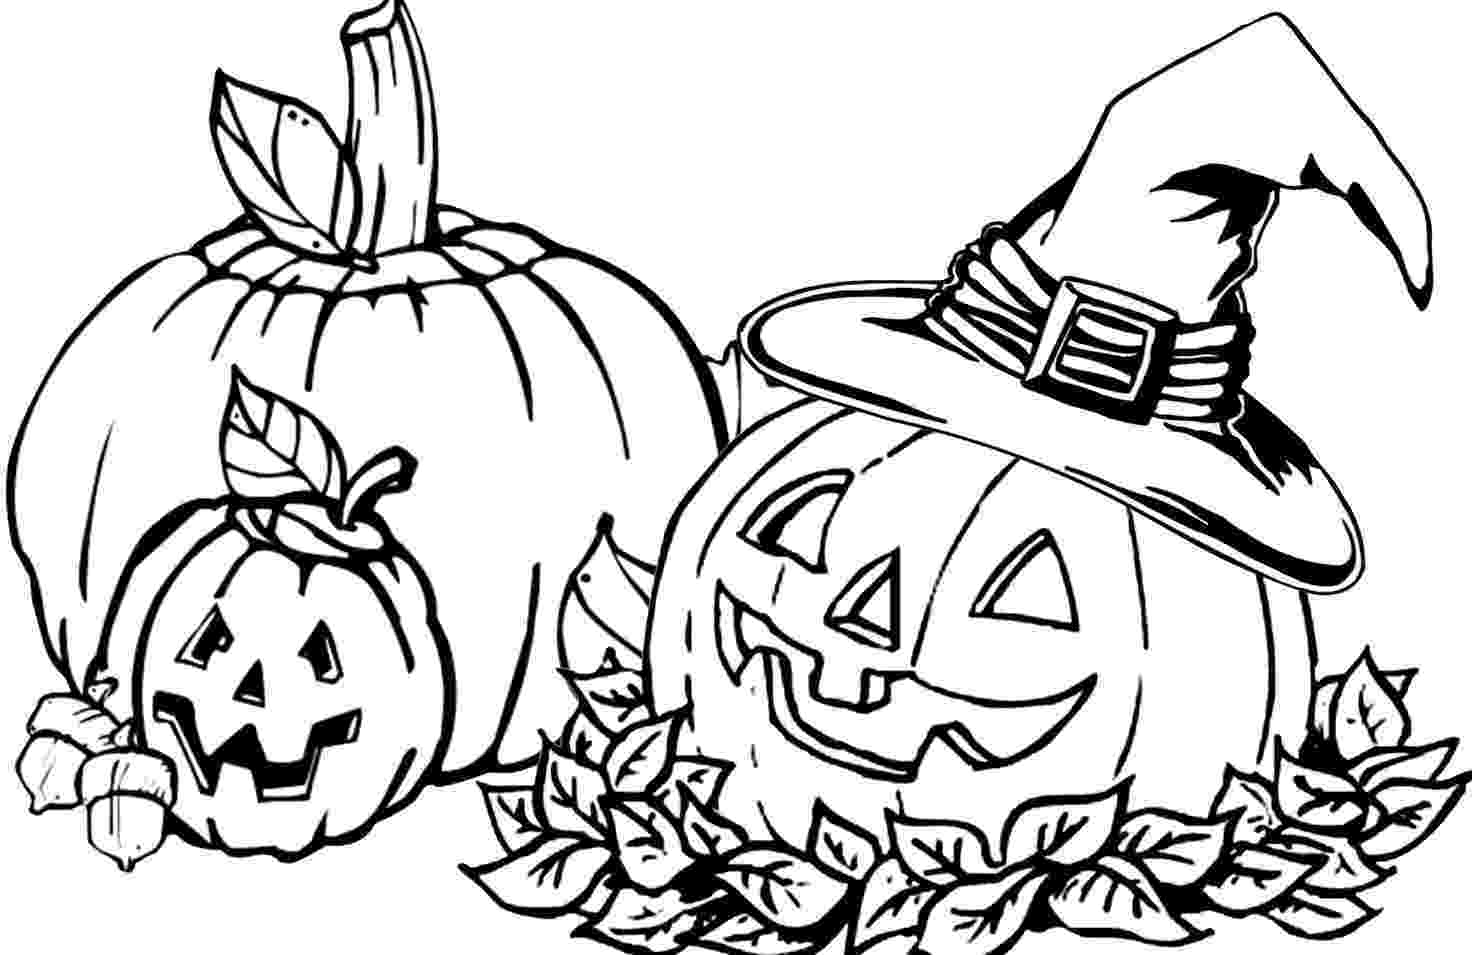 pumpkin to color pumpkin coloring pages coloring pages to print to color pumpkin